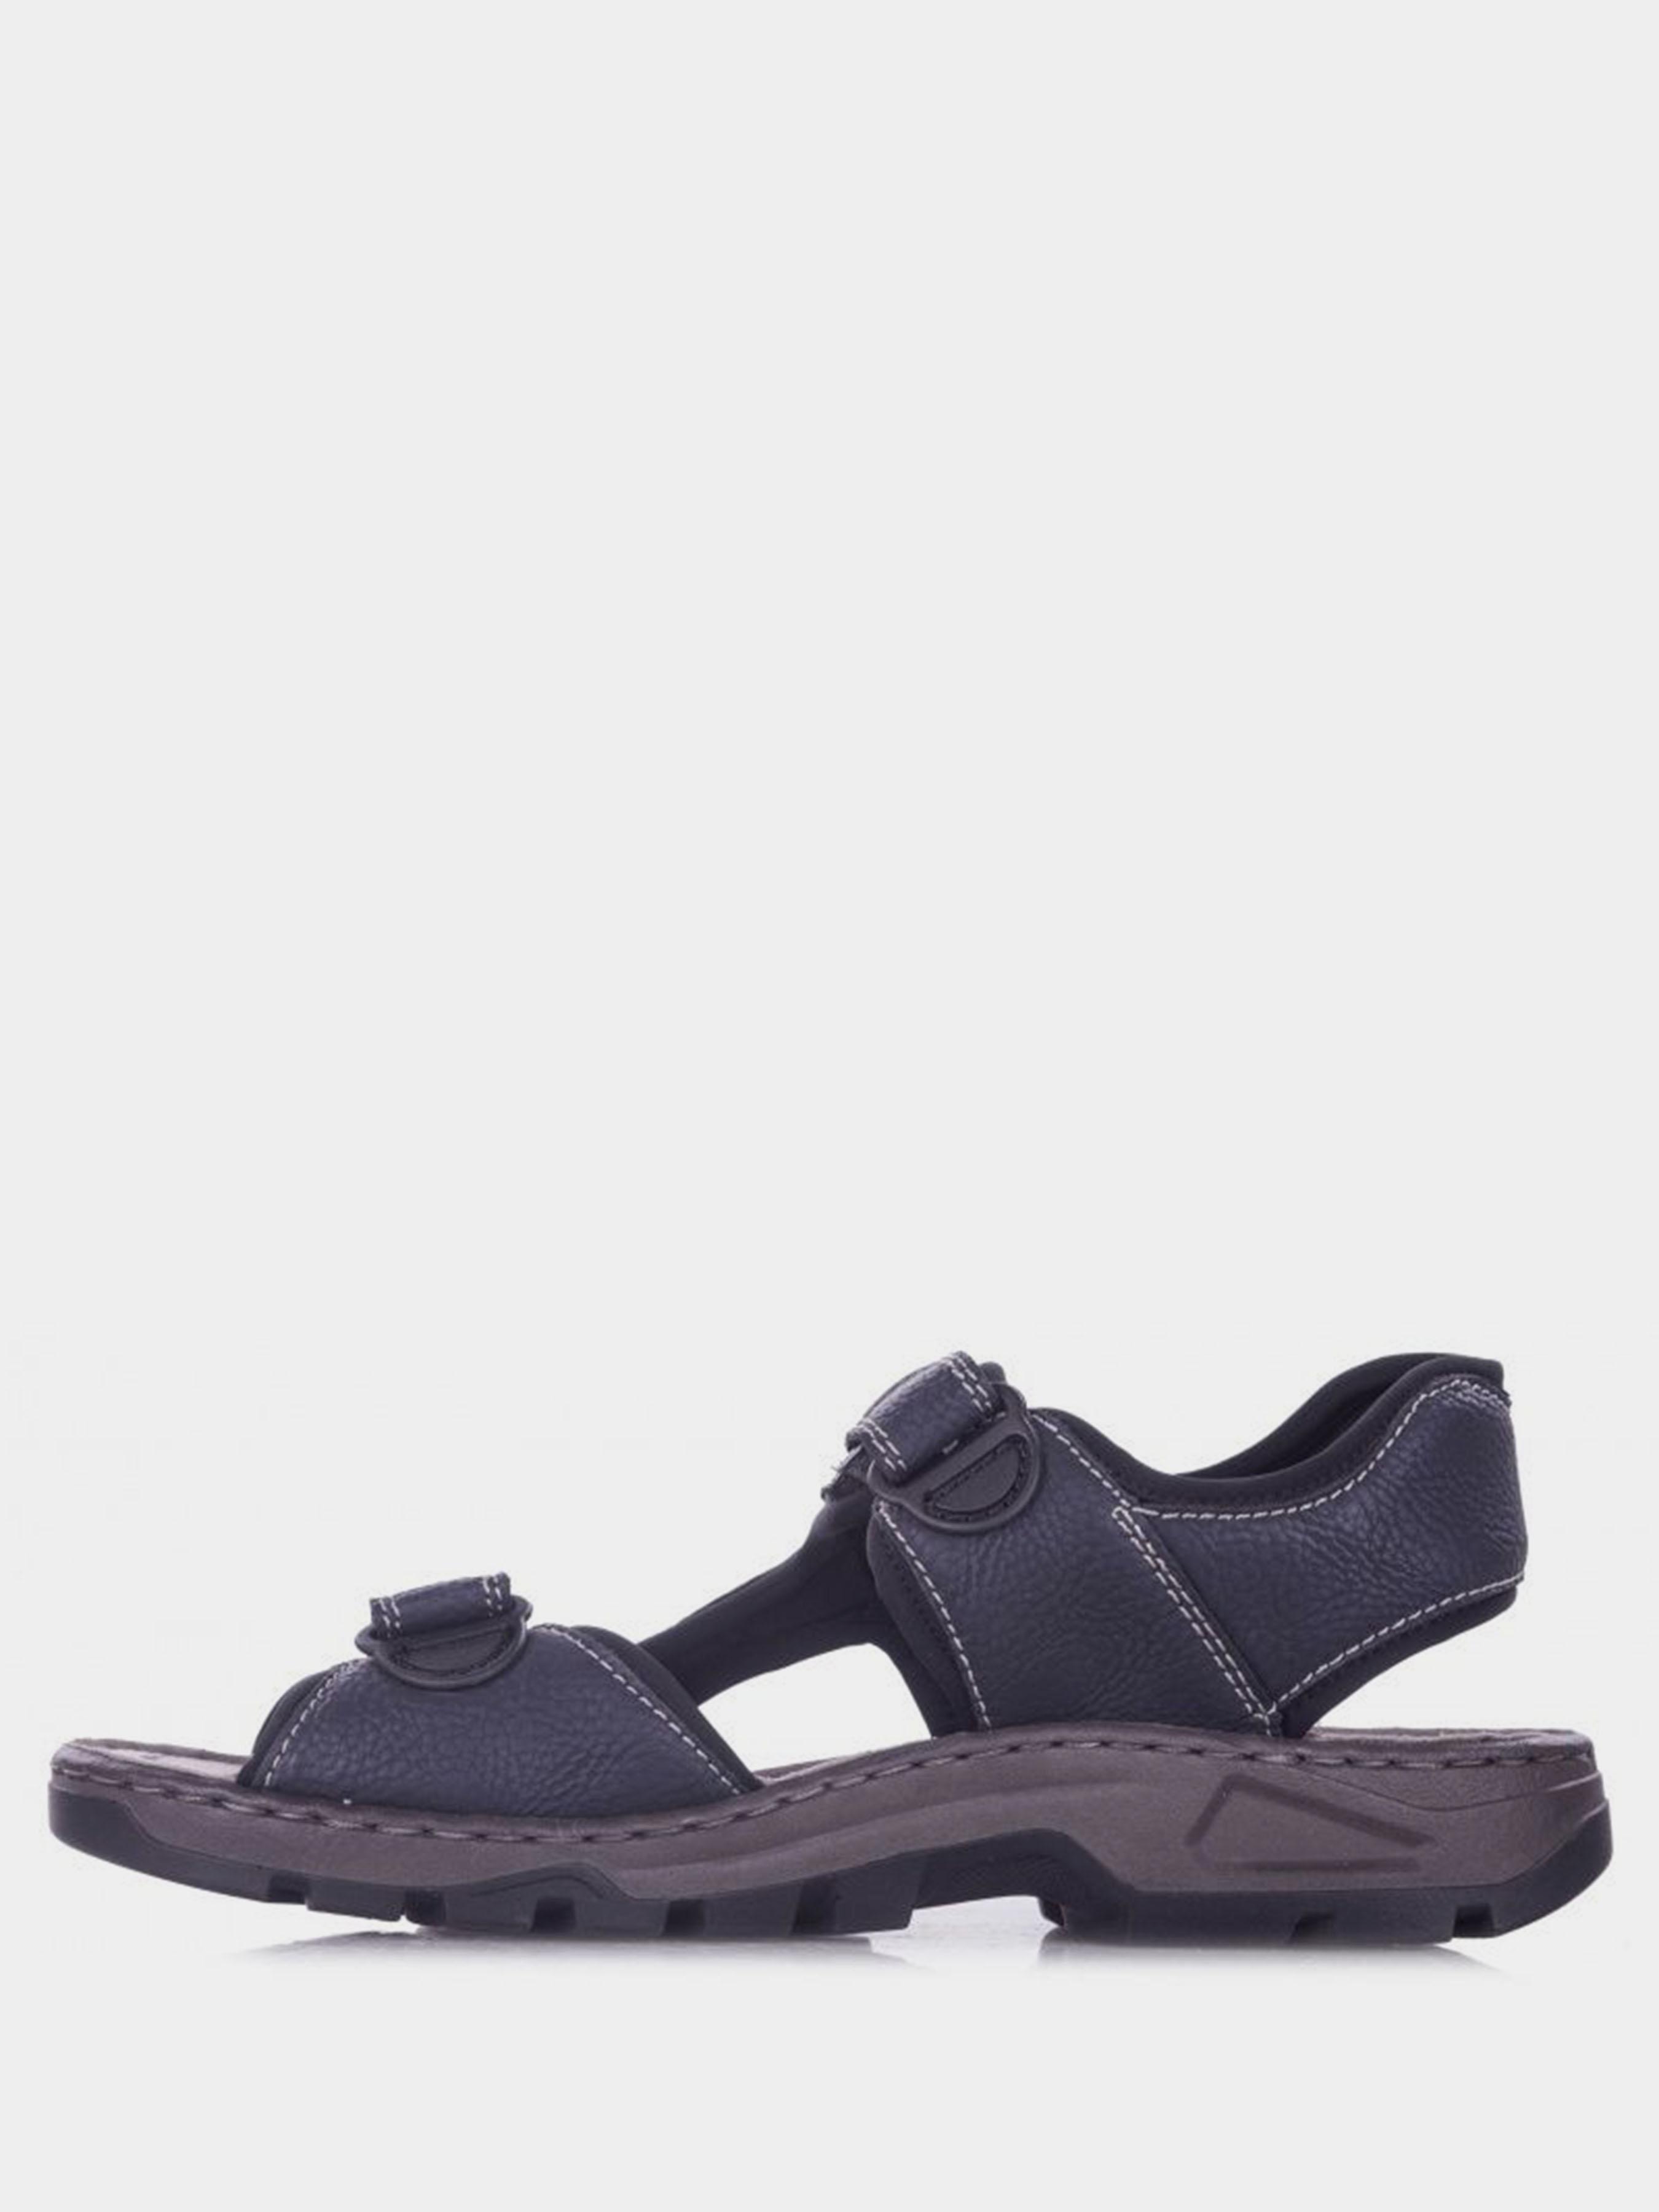 Сандалии для мужчин RIEKER RK582 размерная сетка обуви, 2017